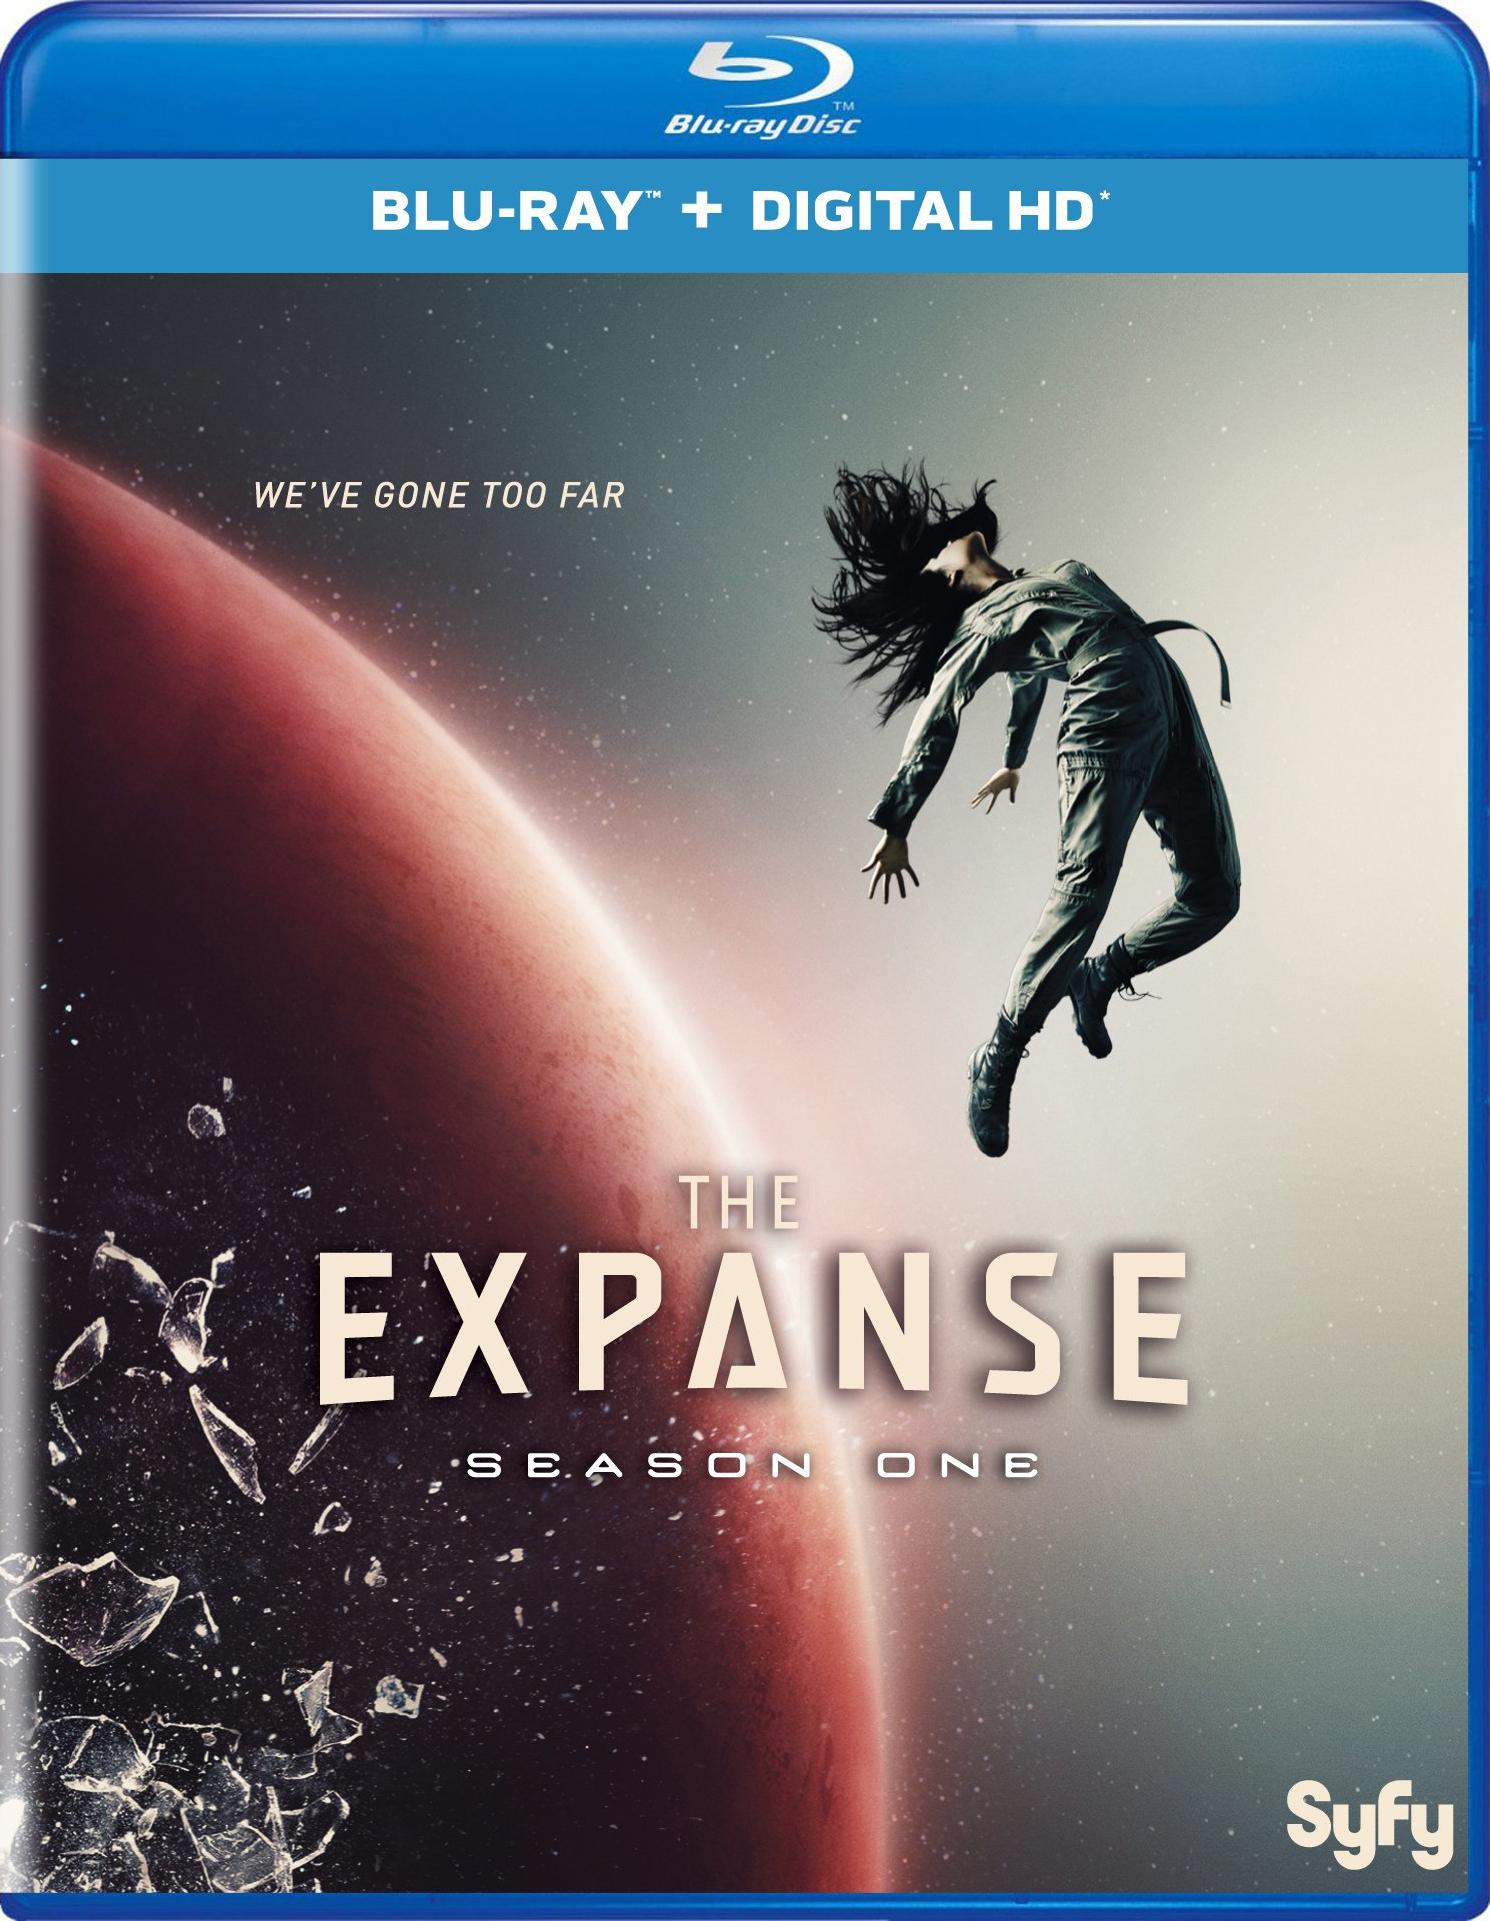 The Expanse: Season 1 (TV) (2015) Blu-ray